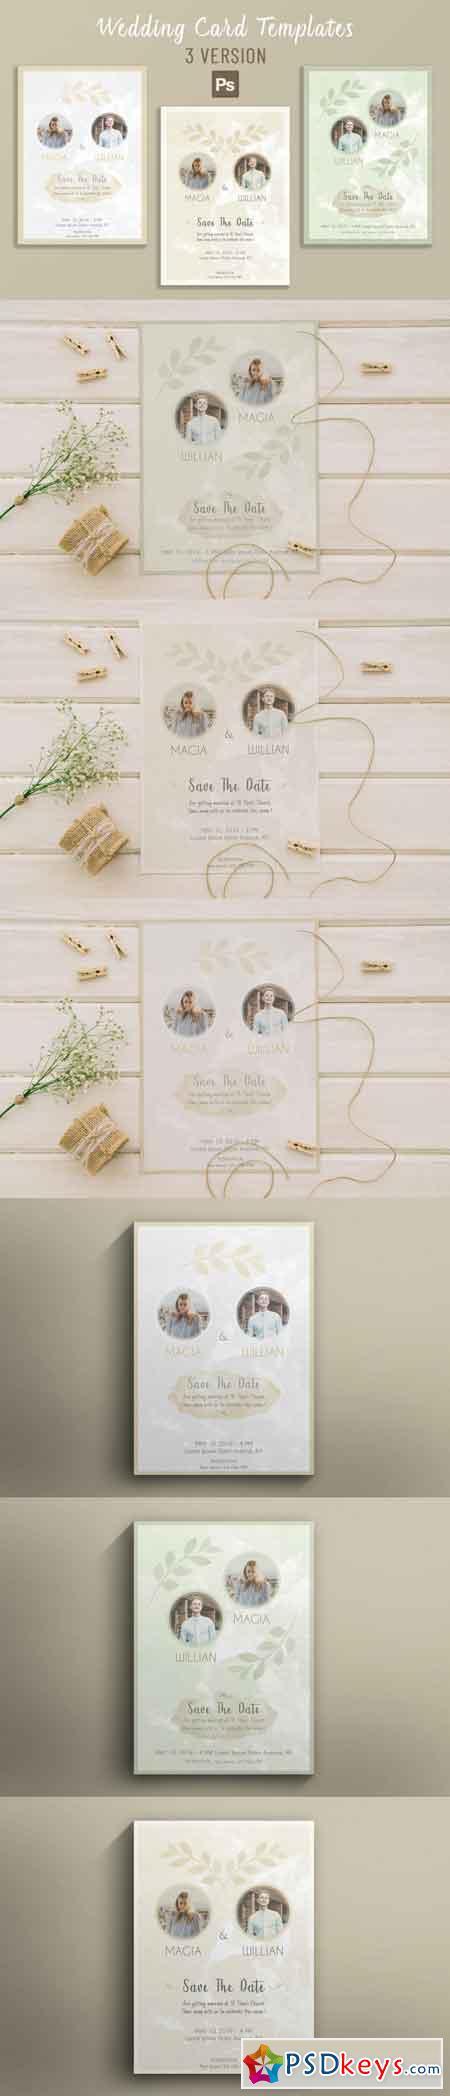 Wedding Card Templates 3512307